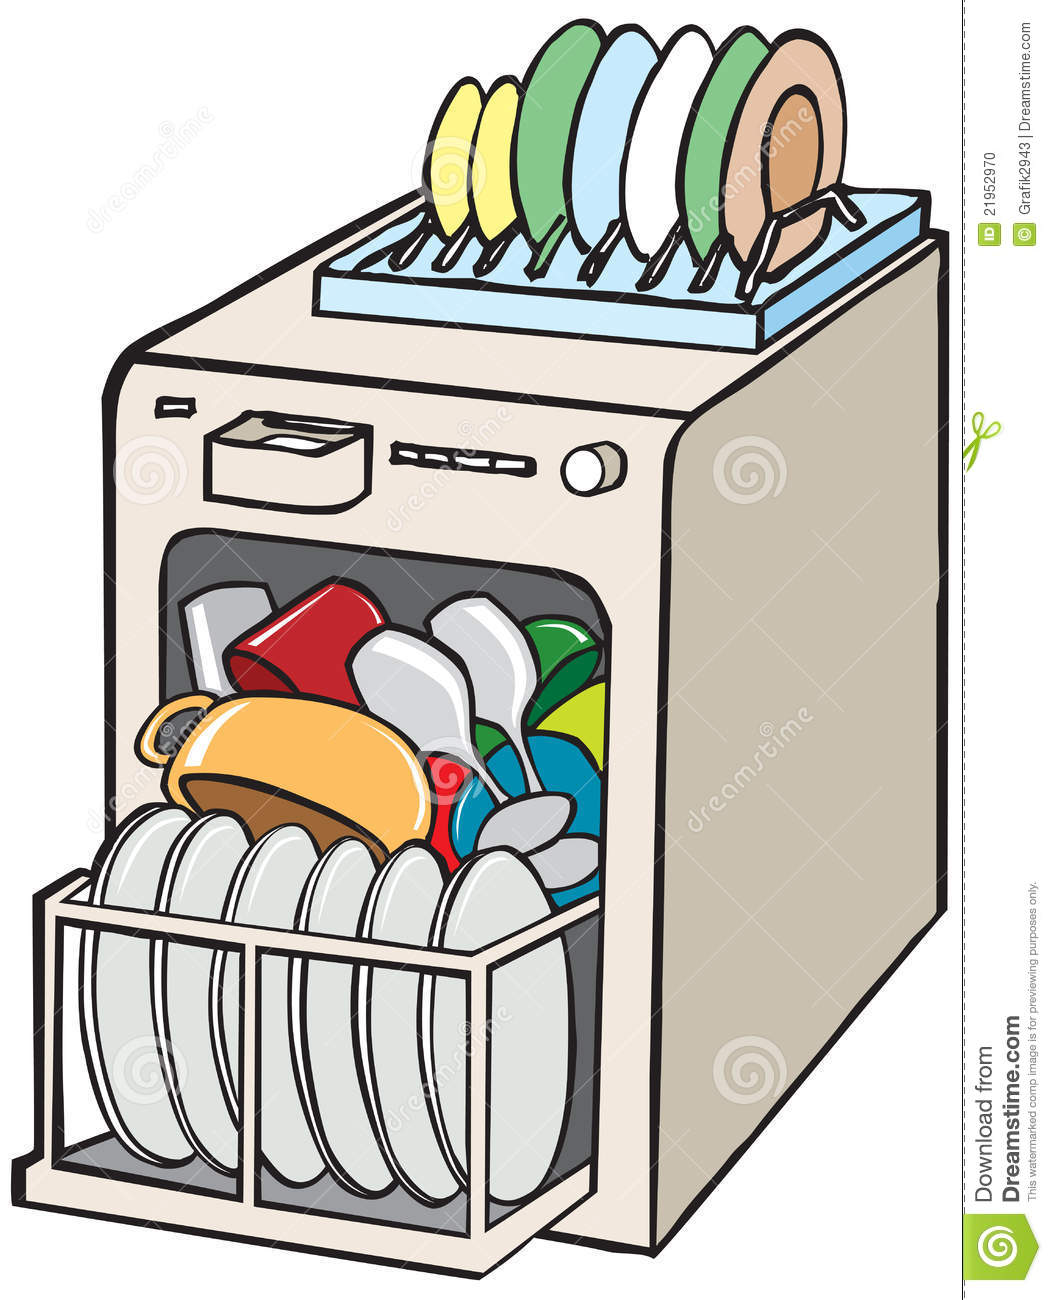 Clean Dishwasher Clipart.